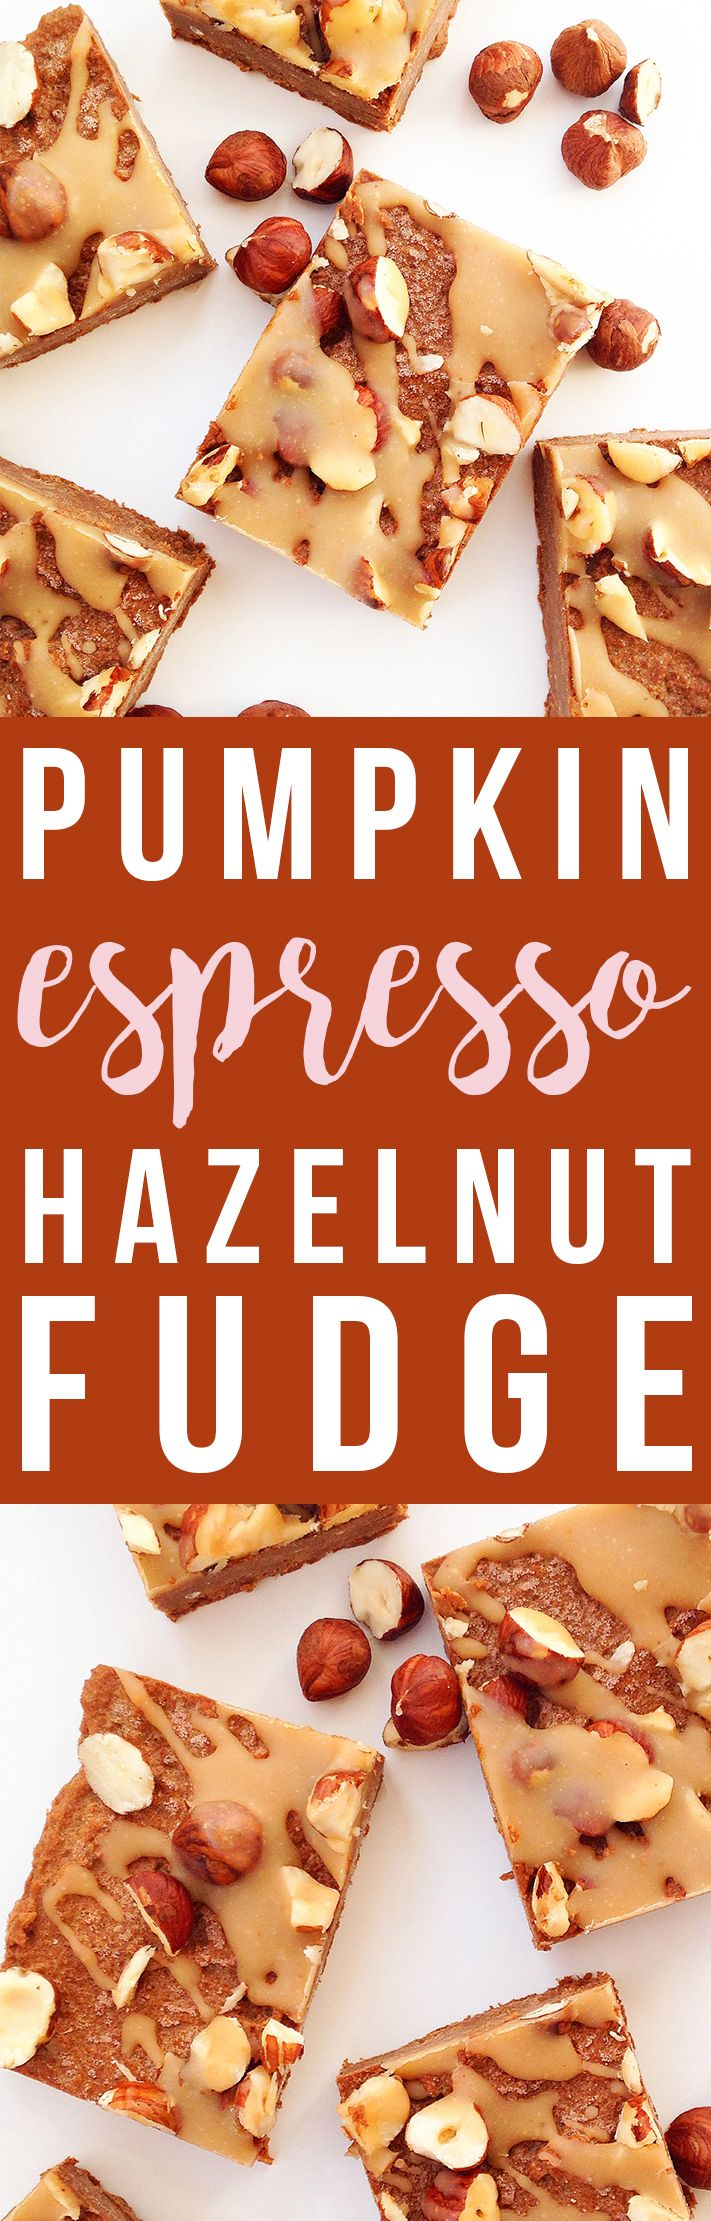 Pumpkin Espresso Hazelnut Fudge (Vegan, Paleo, Raw)   Fresh Planet Flavor